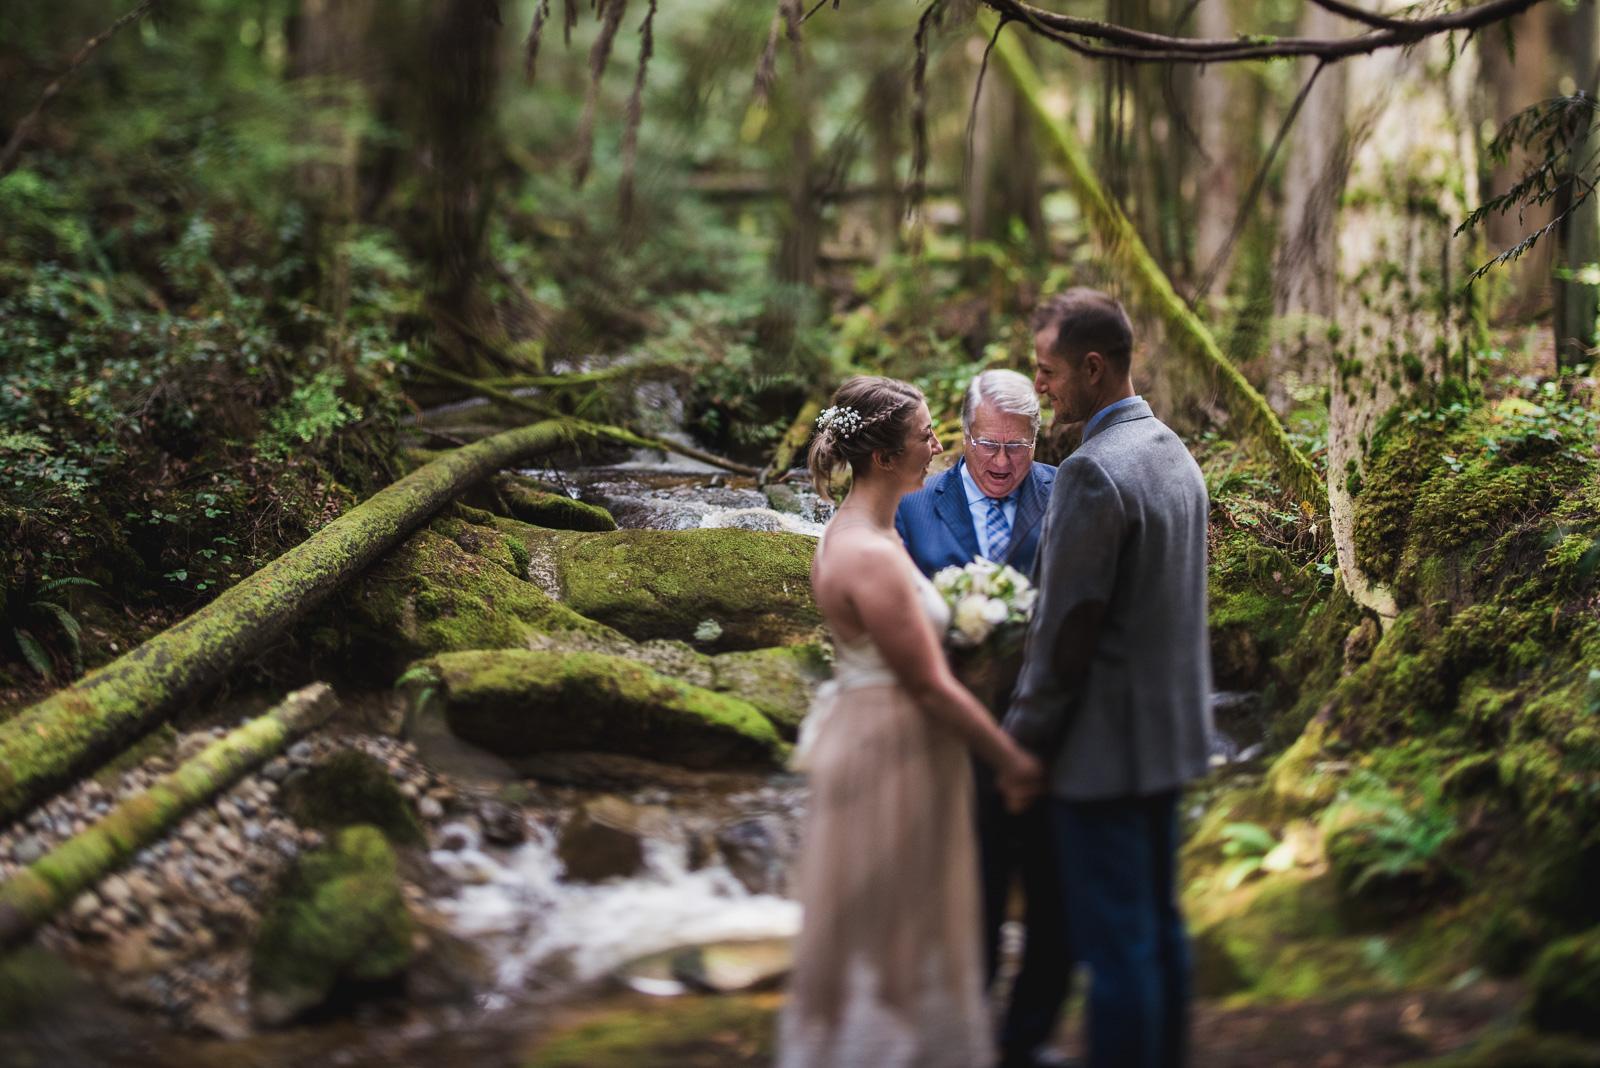 vancouver-island-wedding-photographers-cliff-gilker-park-smugglers-cove-elopement-8.jpg